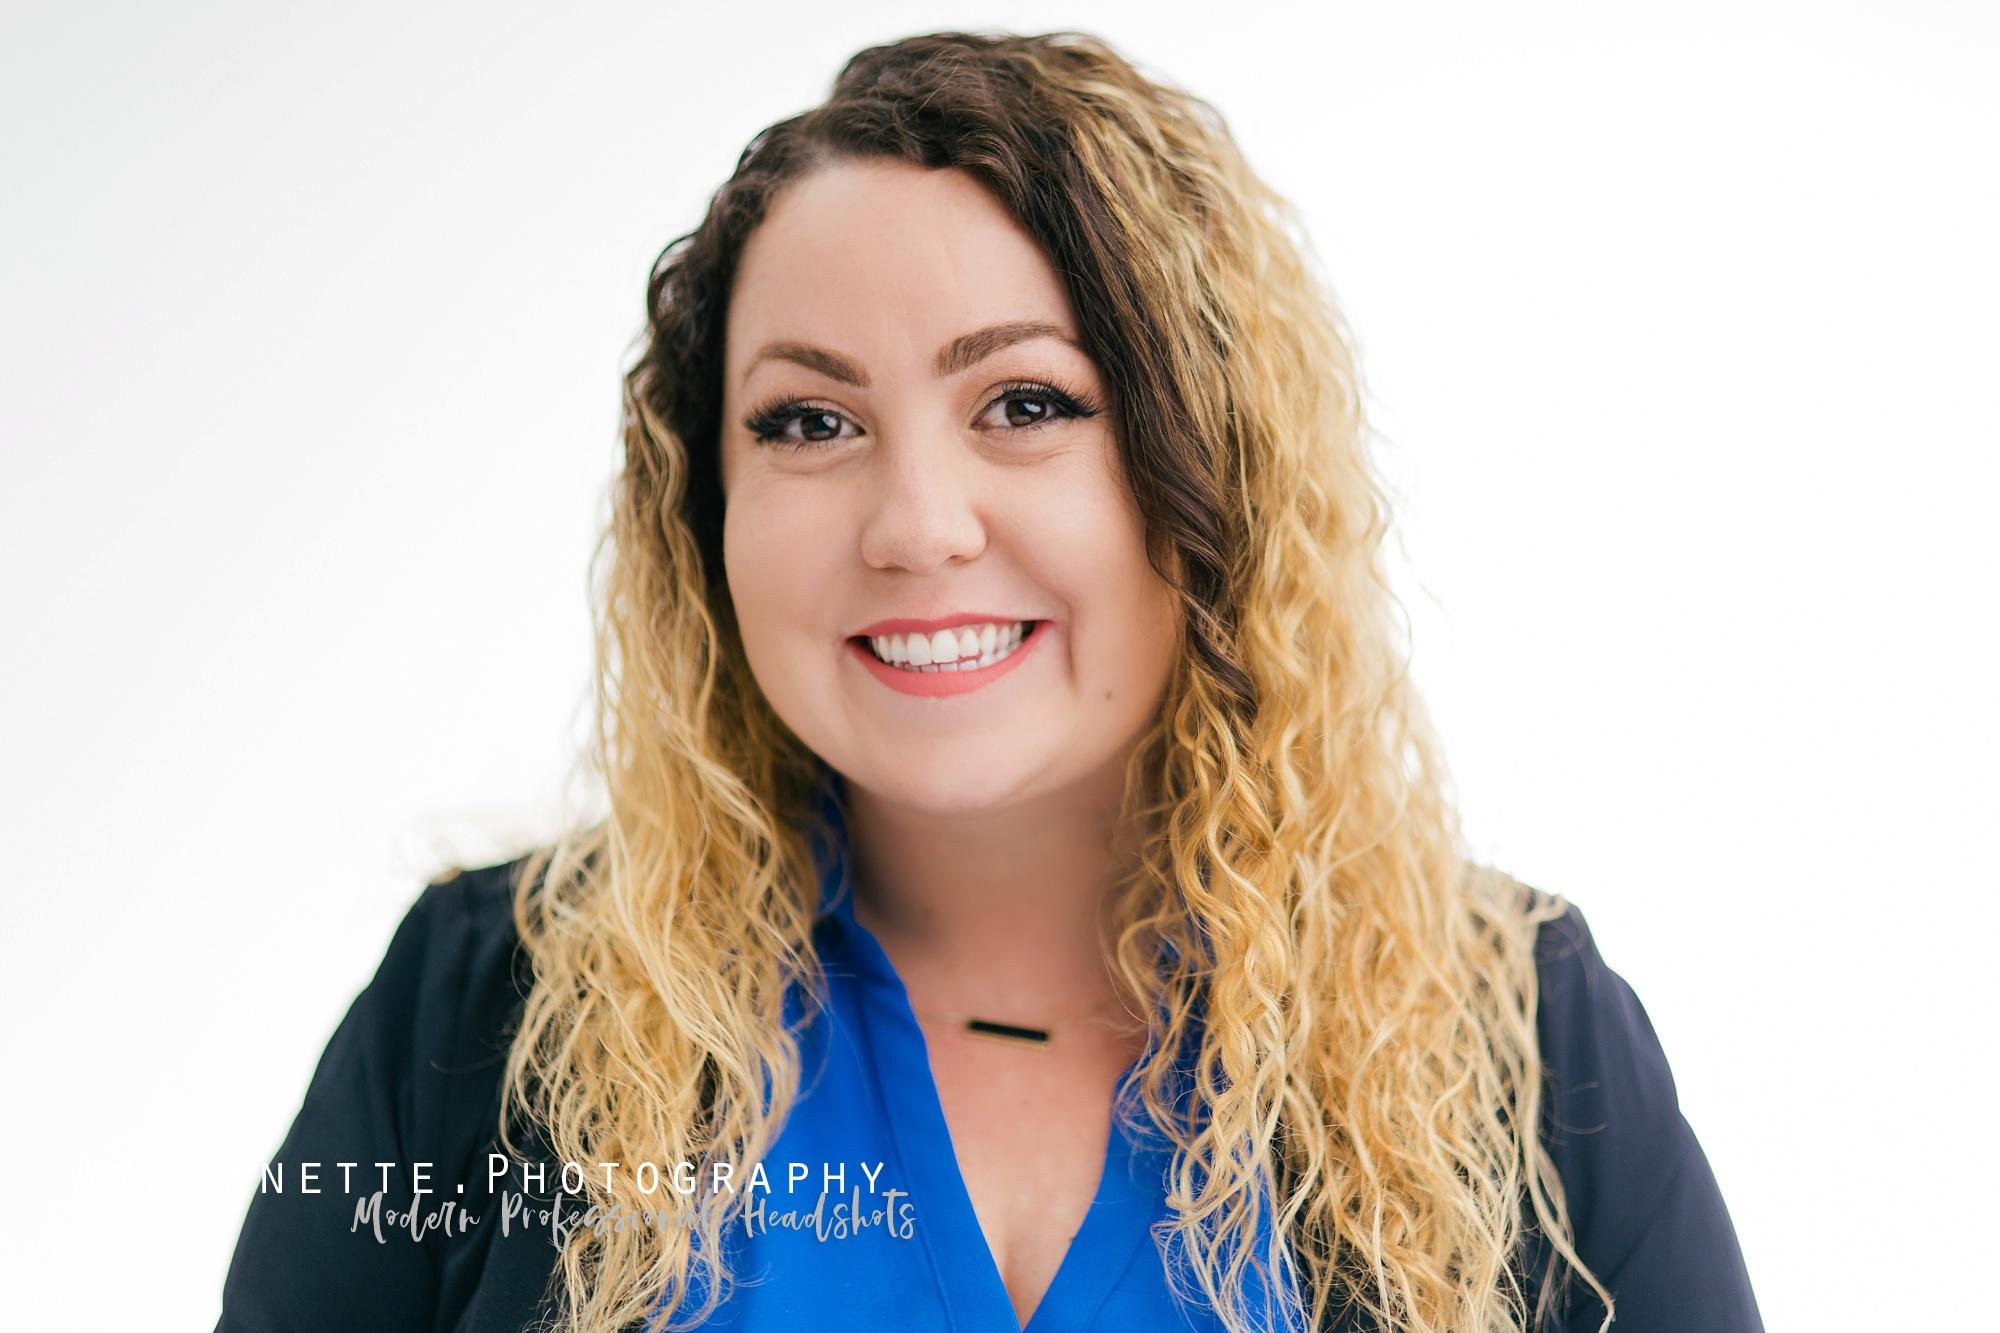 professional business Headshot Arizona Peoria Az Anthem Glendale Az high school portrait photographer Anjeanette Photography Phoenix corporate portraits